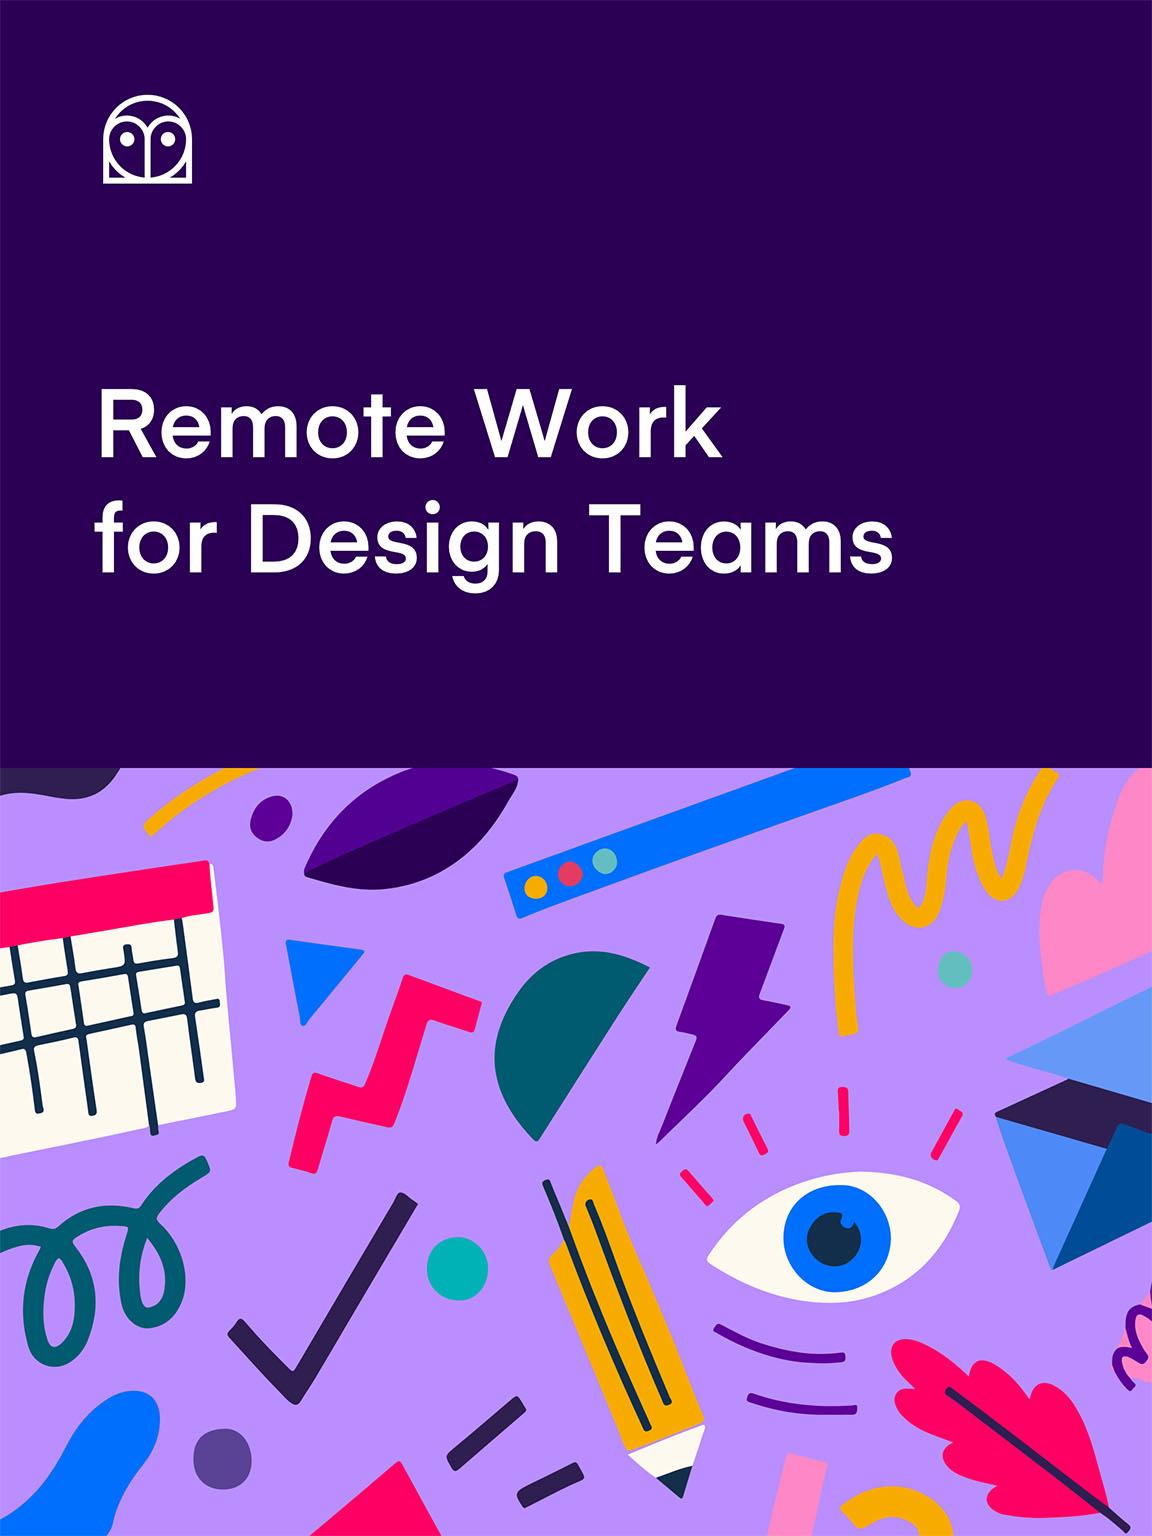 Remote Work for Design Teams